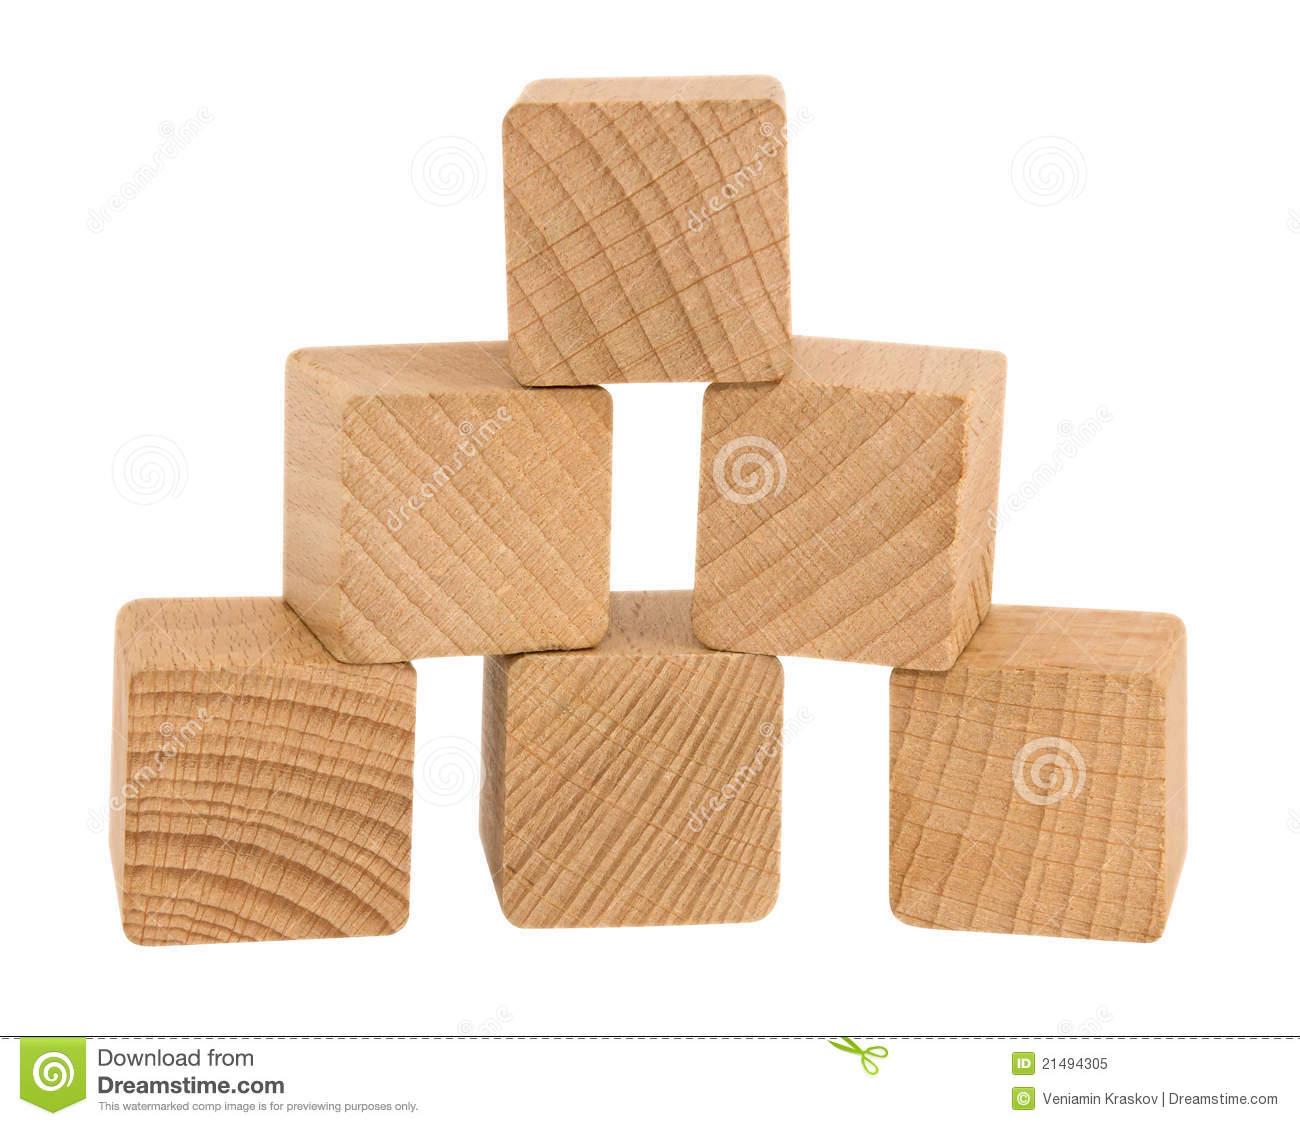 Wooden building blocks clipart image Wooden Blocks Clipart - Clipart Kid image